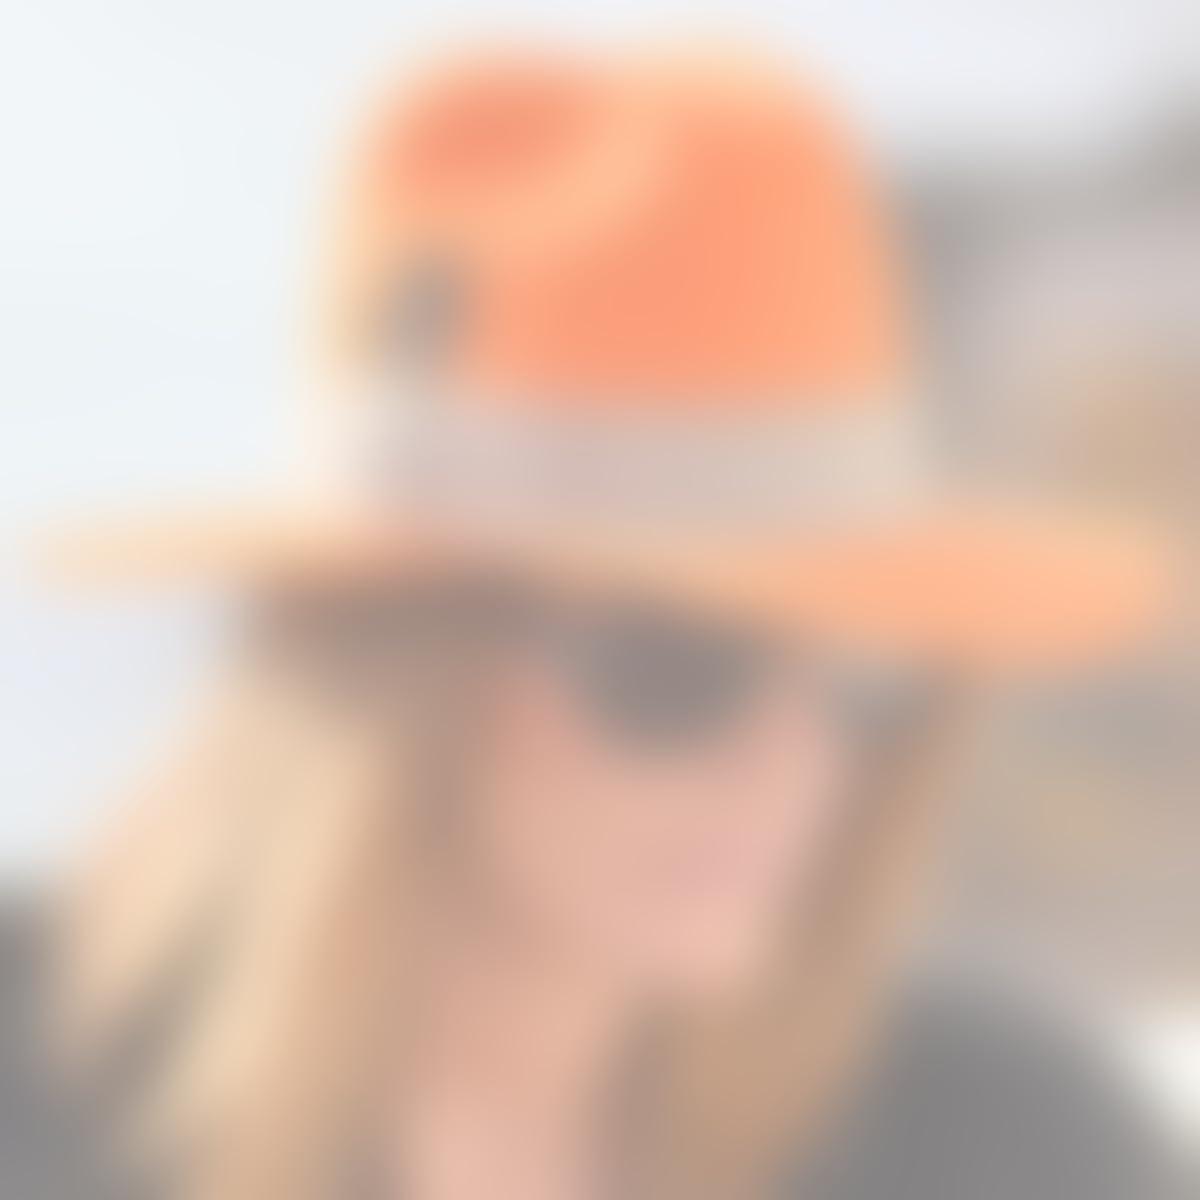 Amazon.com: RACEU ATELIER Orange Queen Hat - Wide Brim Fedora Hat - 100% Wool Felt - Fedoras & Trilby Hats - for Women: Handmade